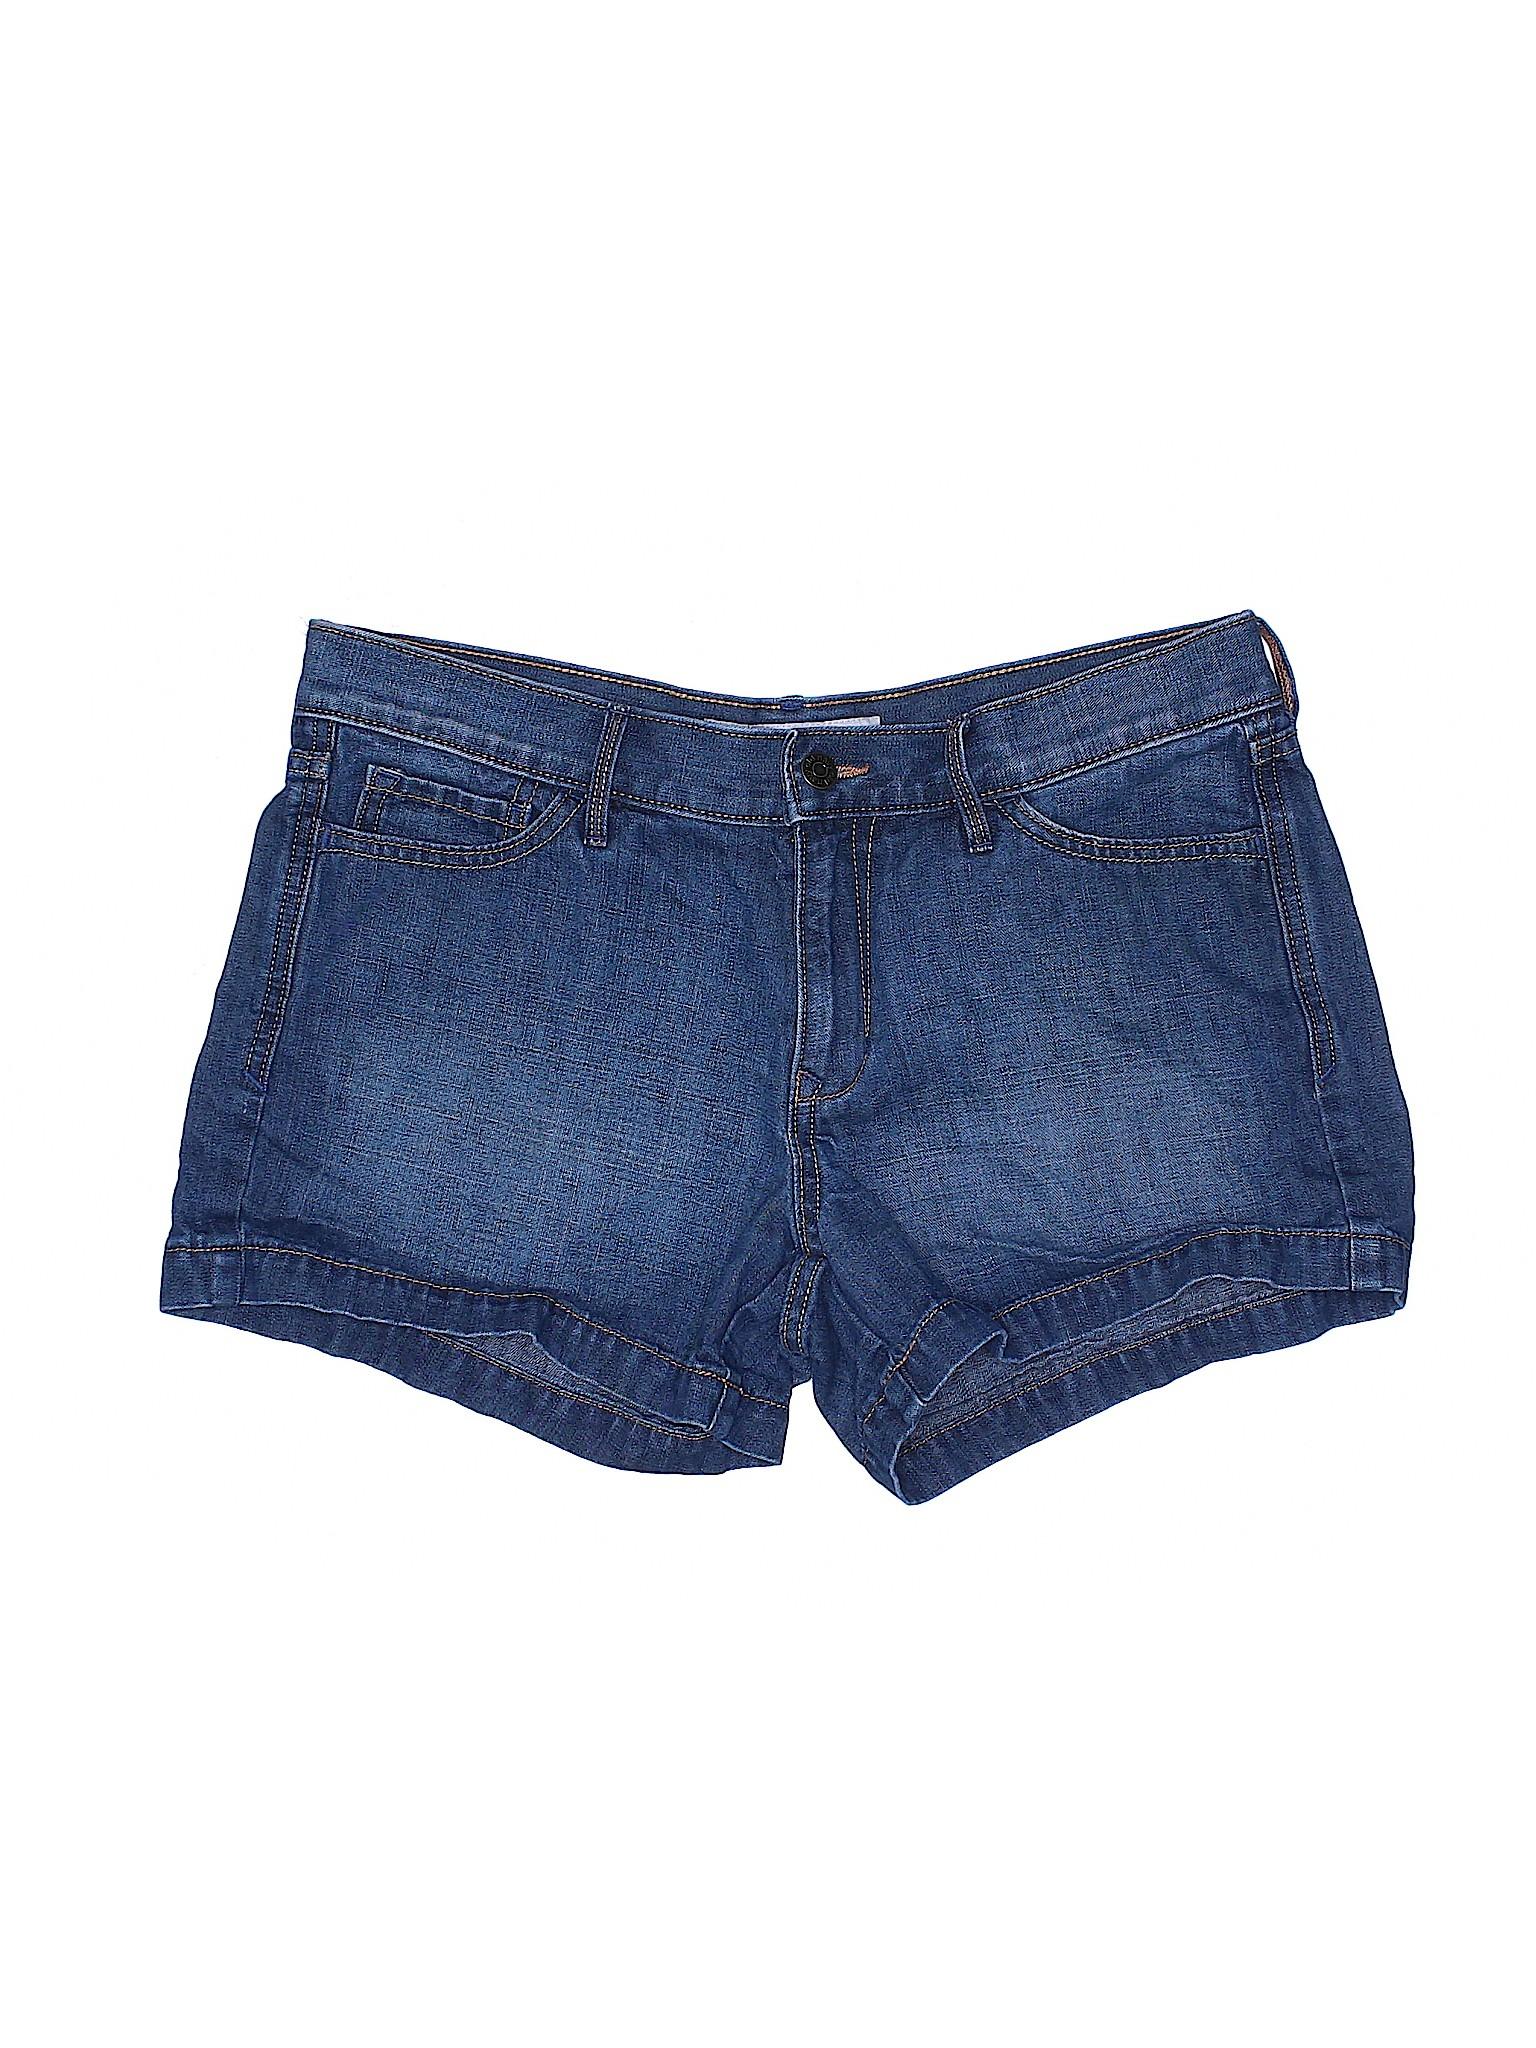 Shorts Navy Shorts Denim Denim Boutique Boutique Navy Boutique Old Old Sxq6IwU